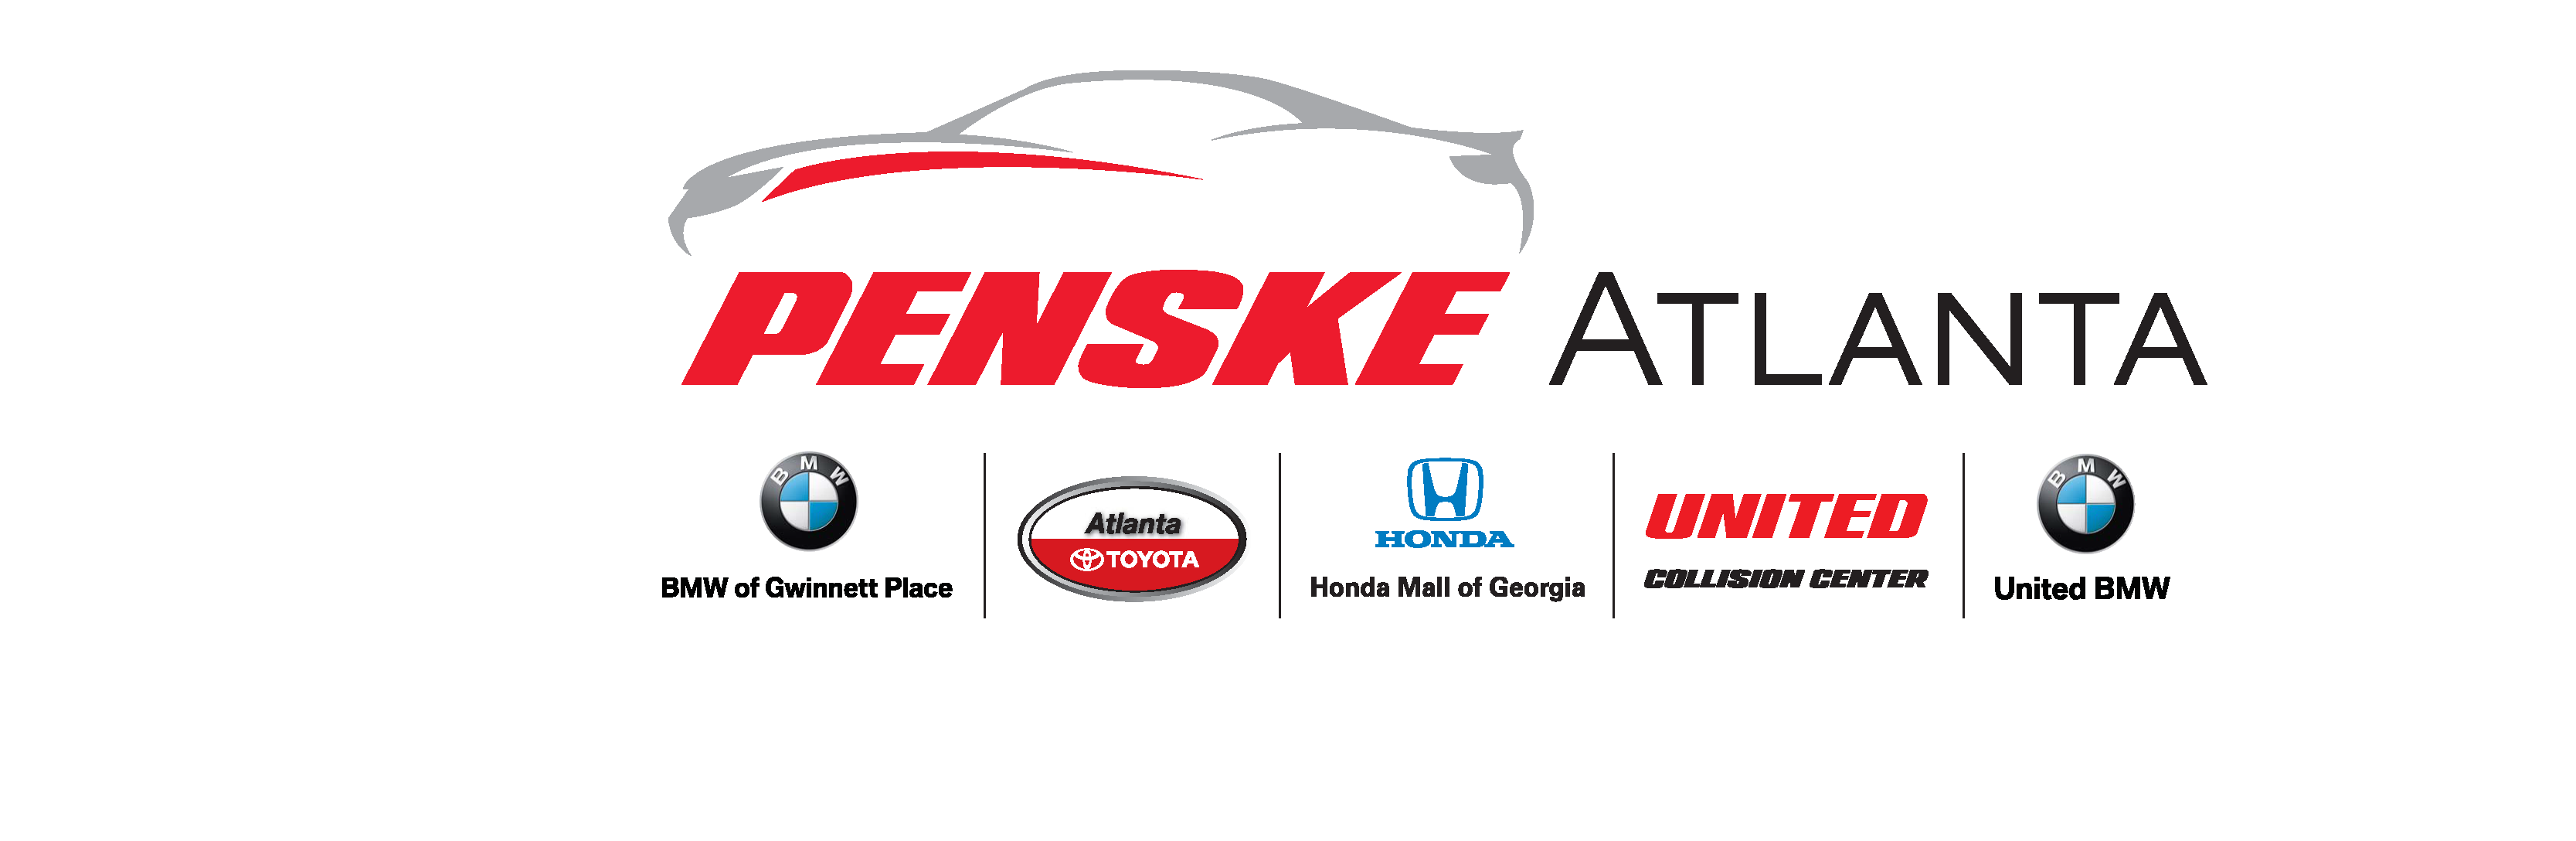 Penske Automotive Group Company Logo